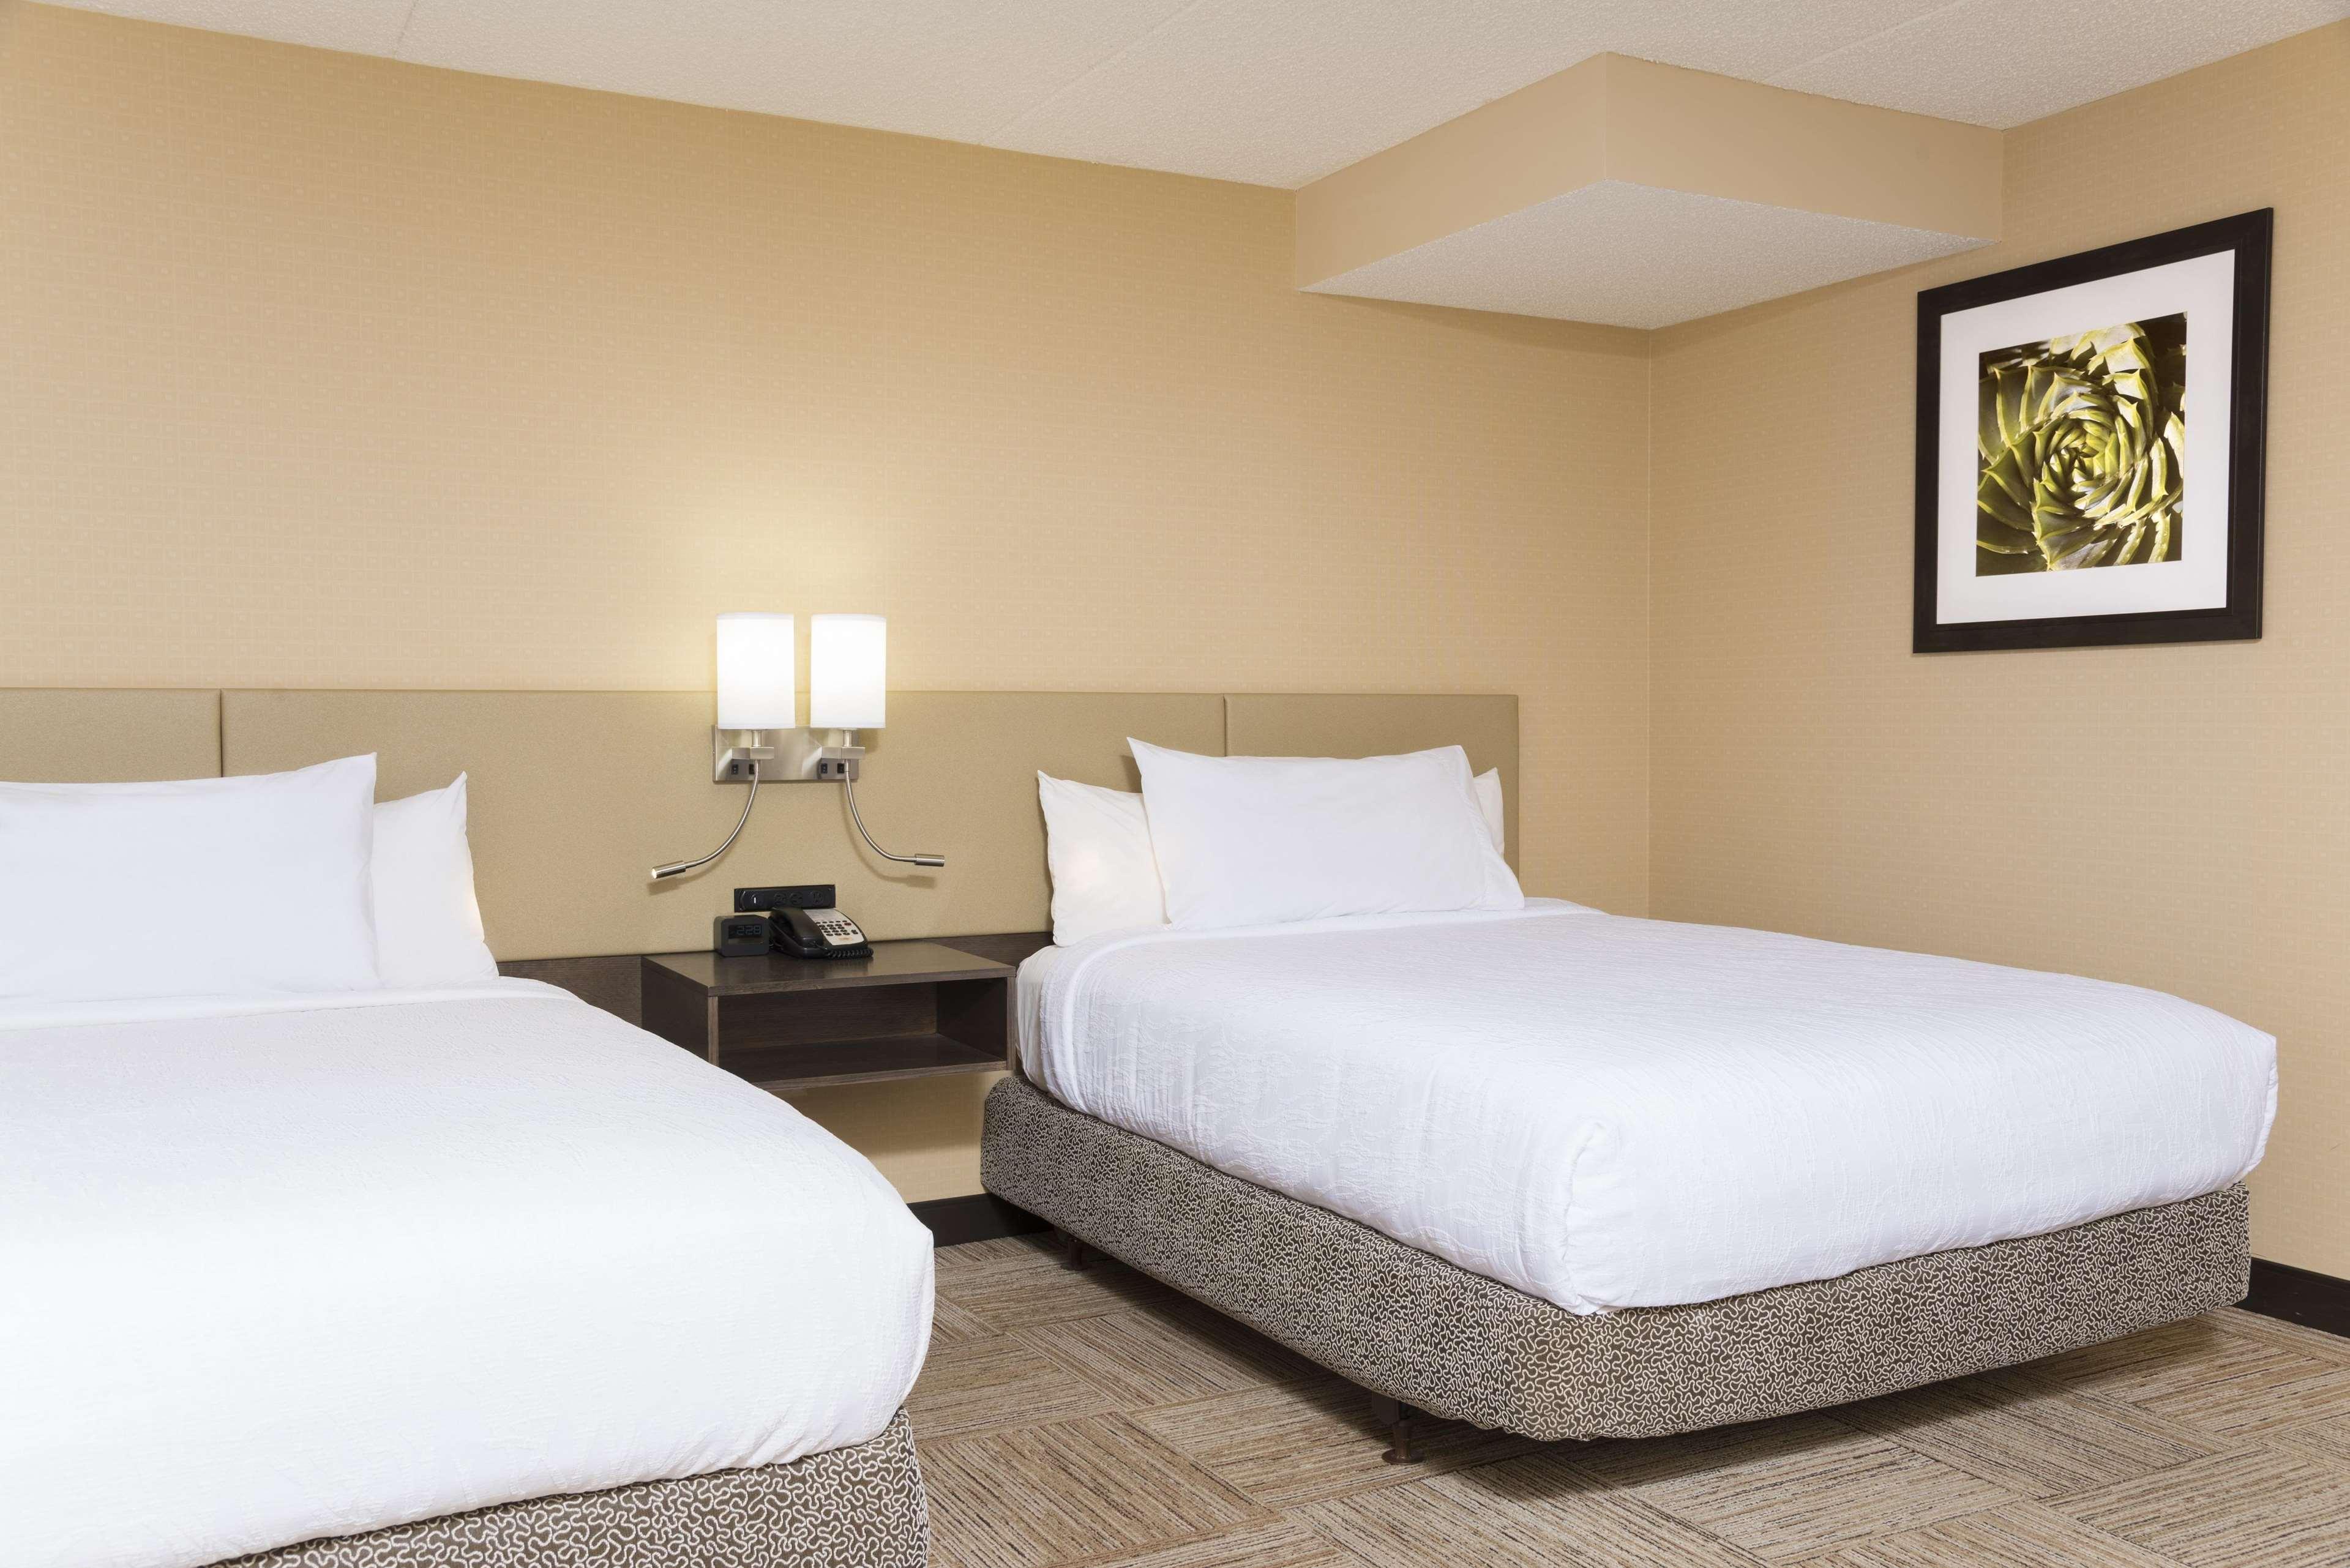 Hilton Garden Inn West Lafayette Wabash Landing image 51